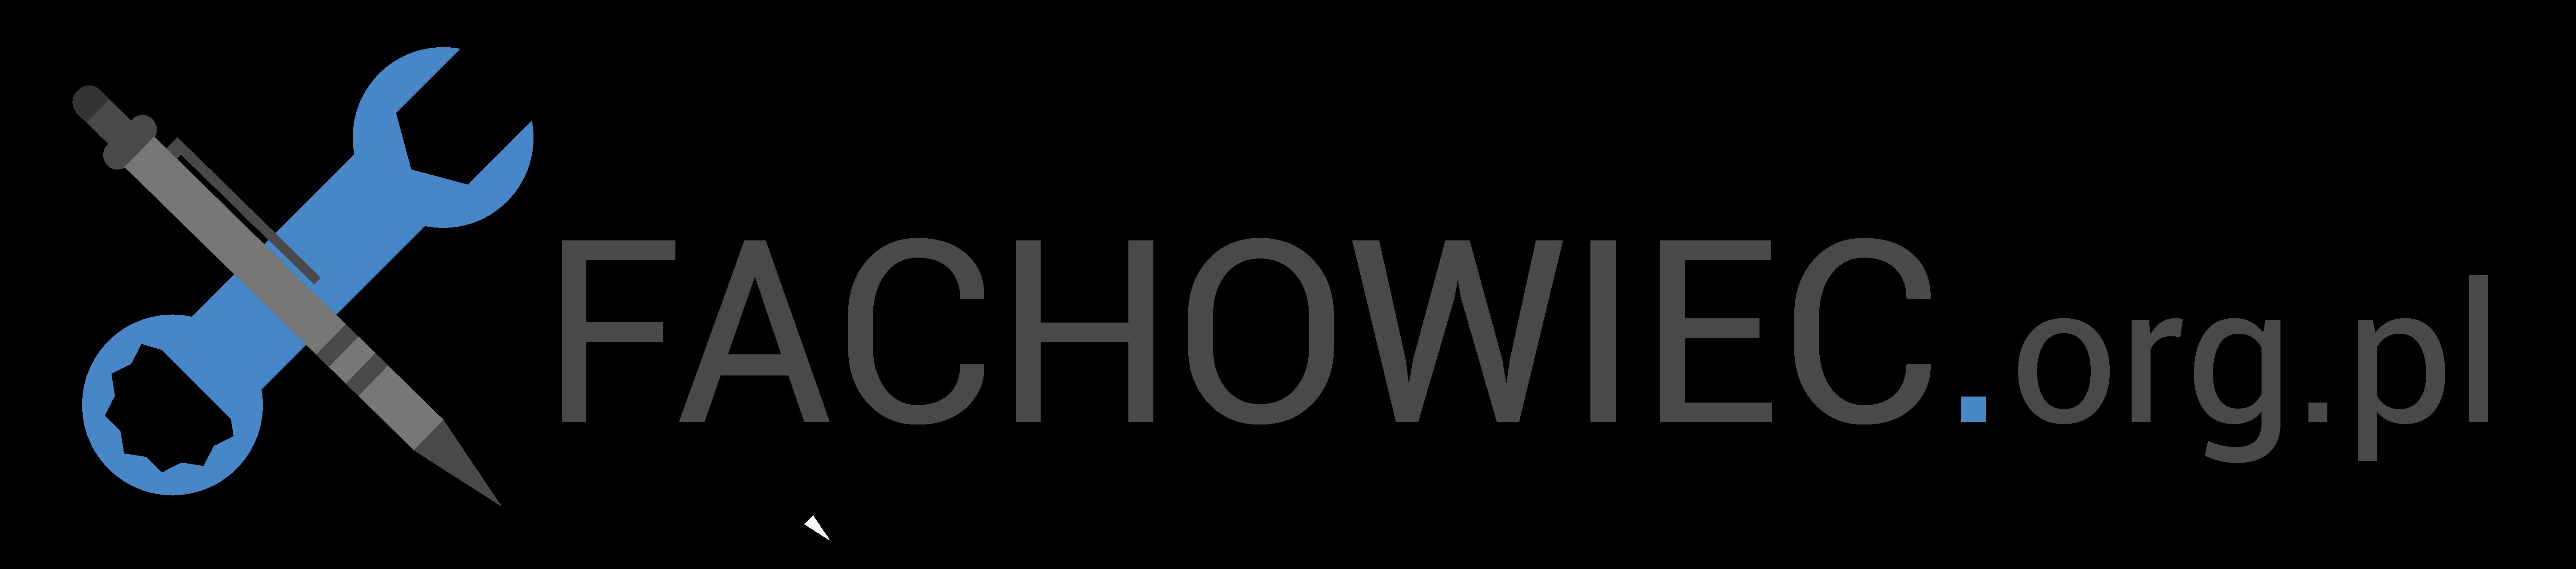 fachowiec.org.pl